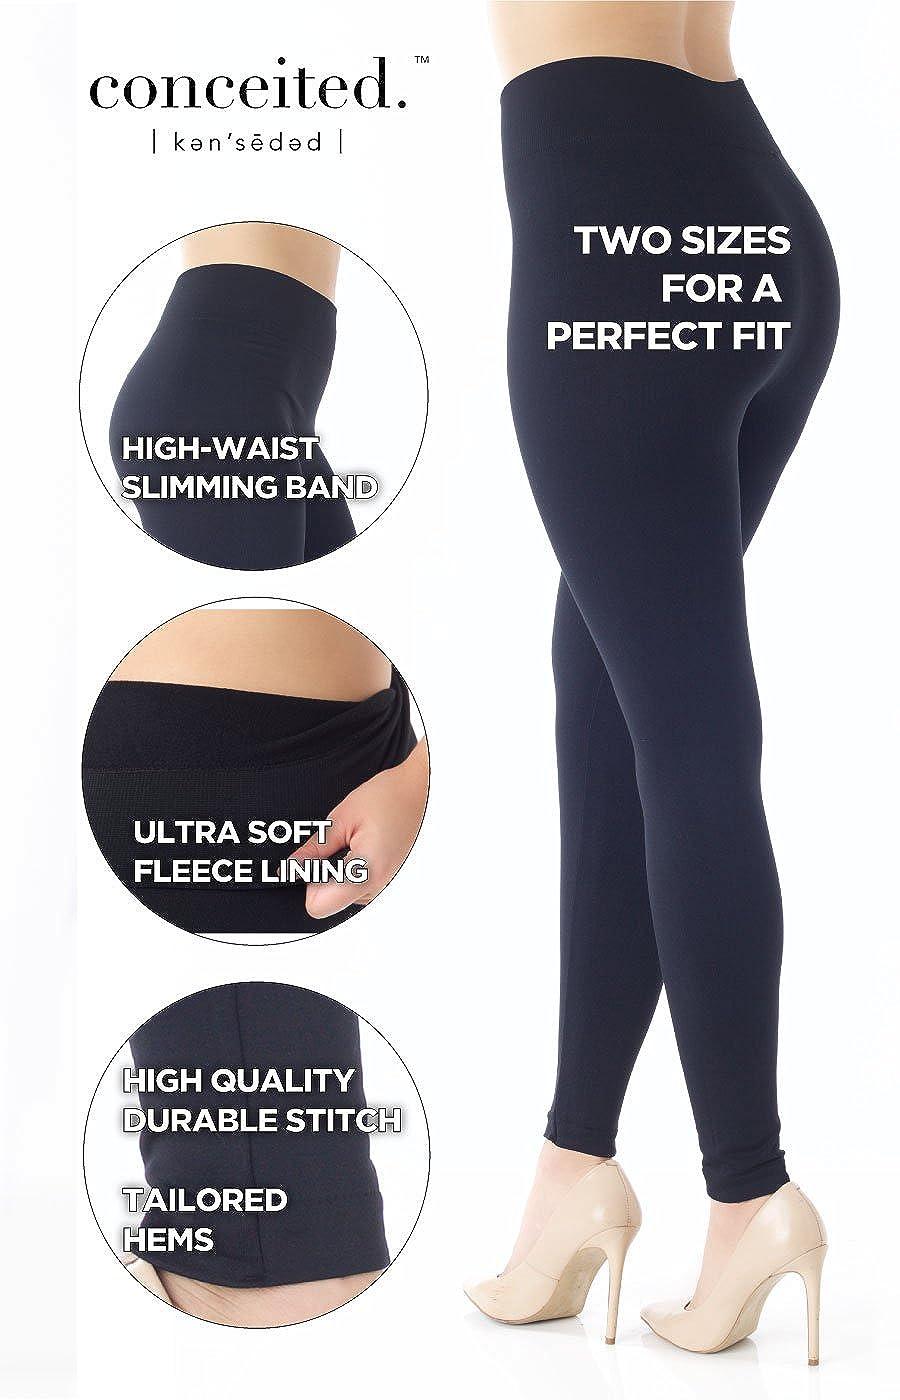 ececeb72035fe Premium Women s Fleece Lined Leggings - High Waist - Regular and Plus Size  - 20+ Colors at Amazon Women s Clothing store